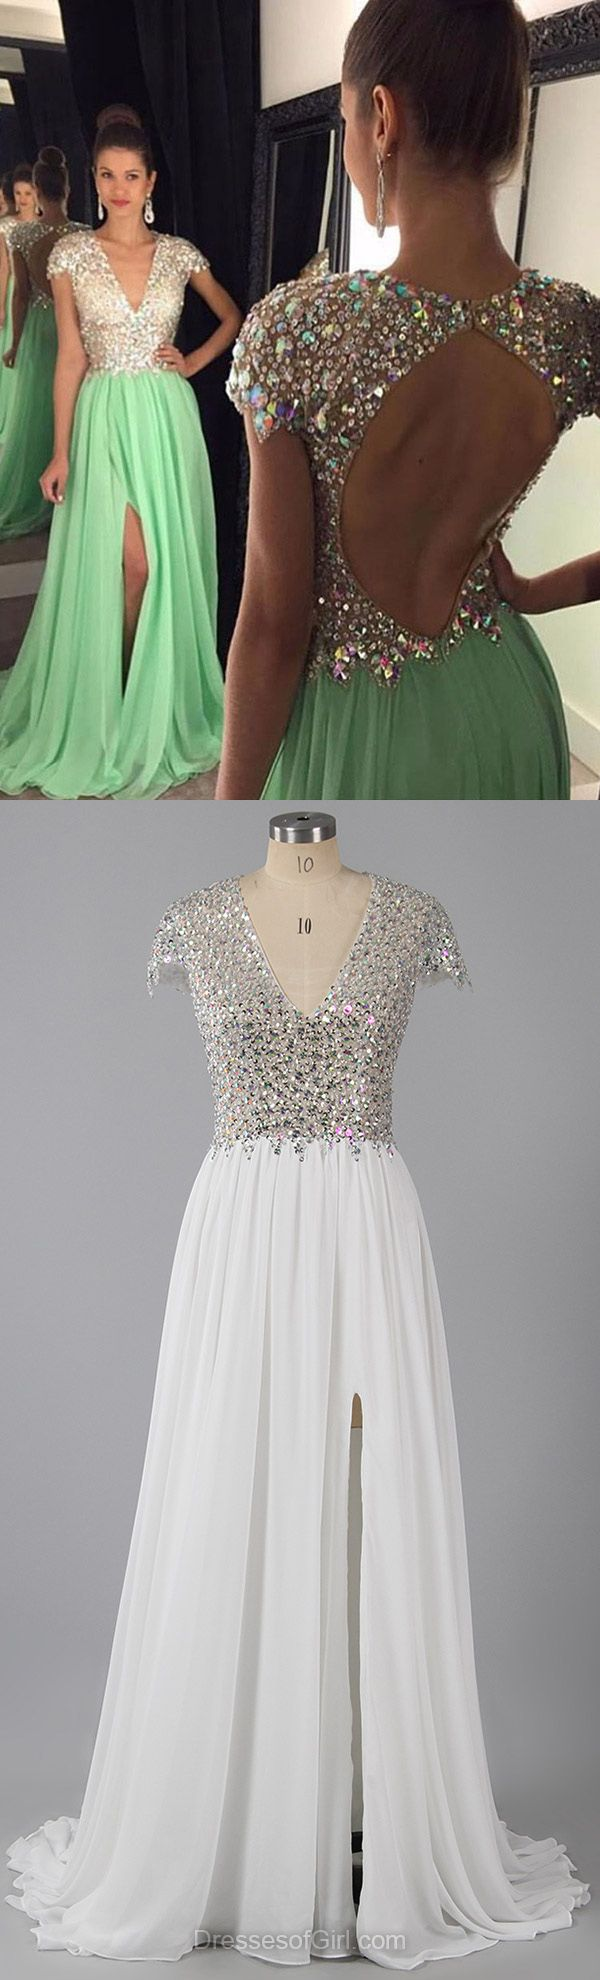 Open Back V-neck Chiffon Tulle Sweep Train Split Front Prom Dresses